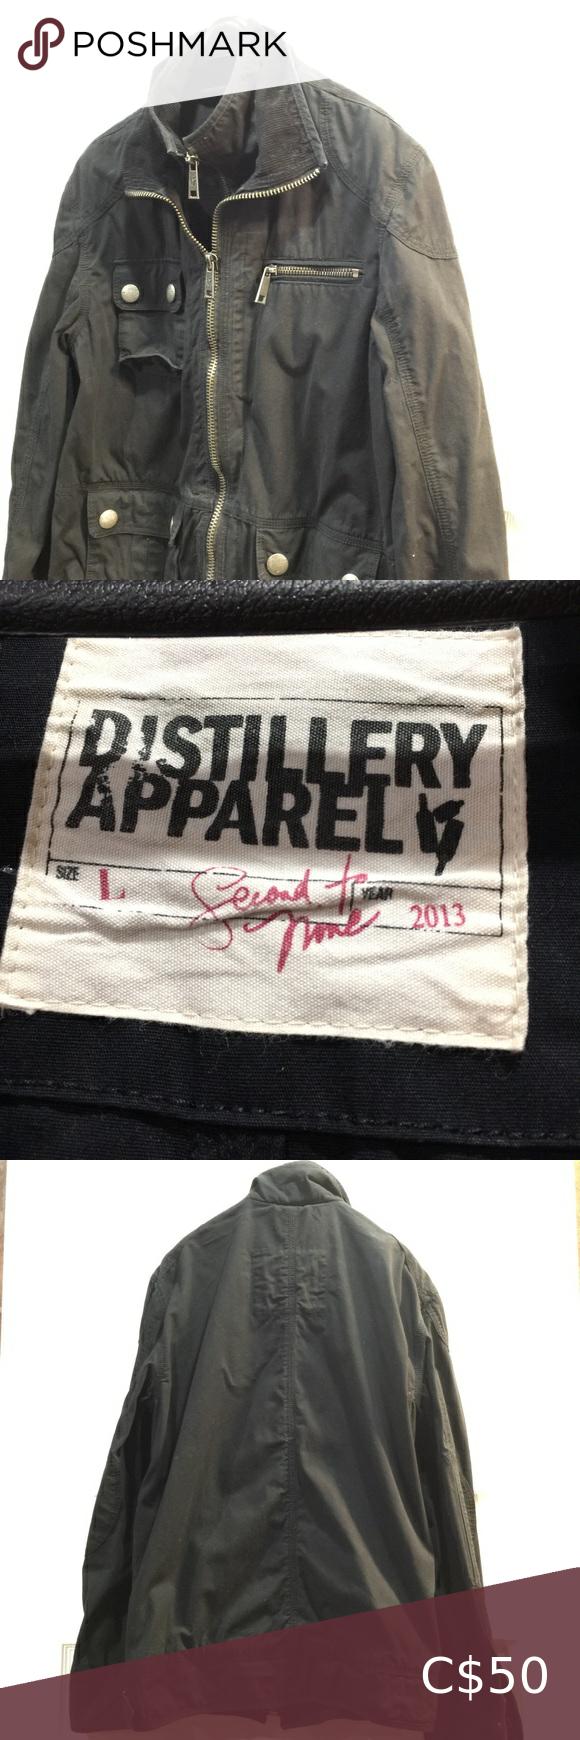 Distillery Apparel Jacket Clothes Design North Face Puffer Jacket Jackets [ 1740 x 580 Pixel ]